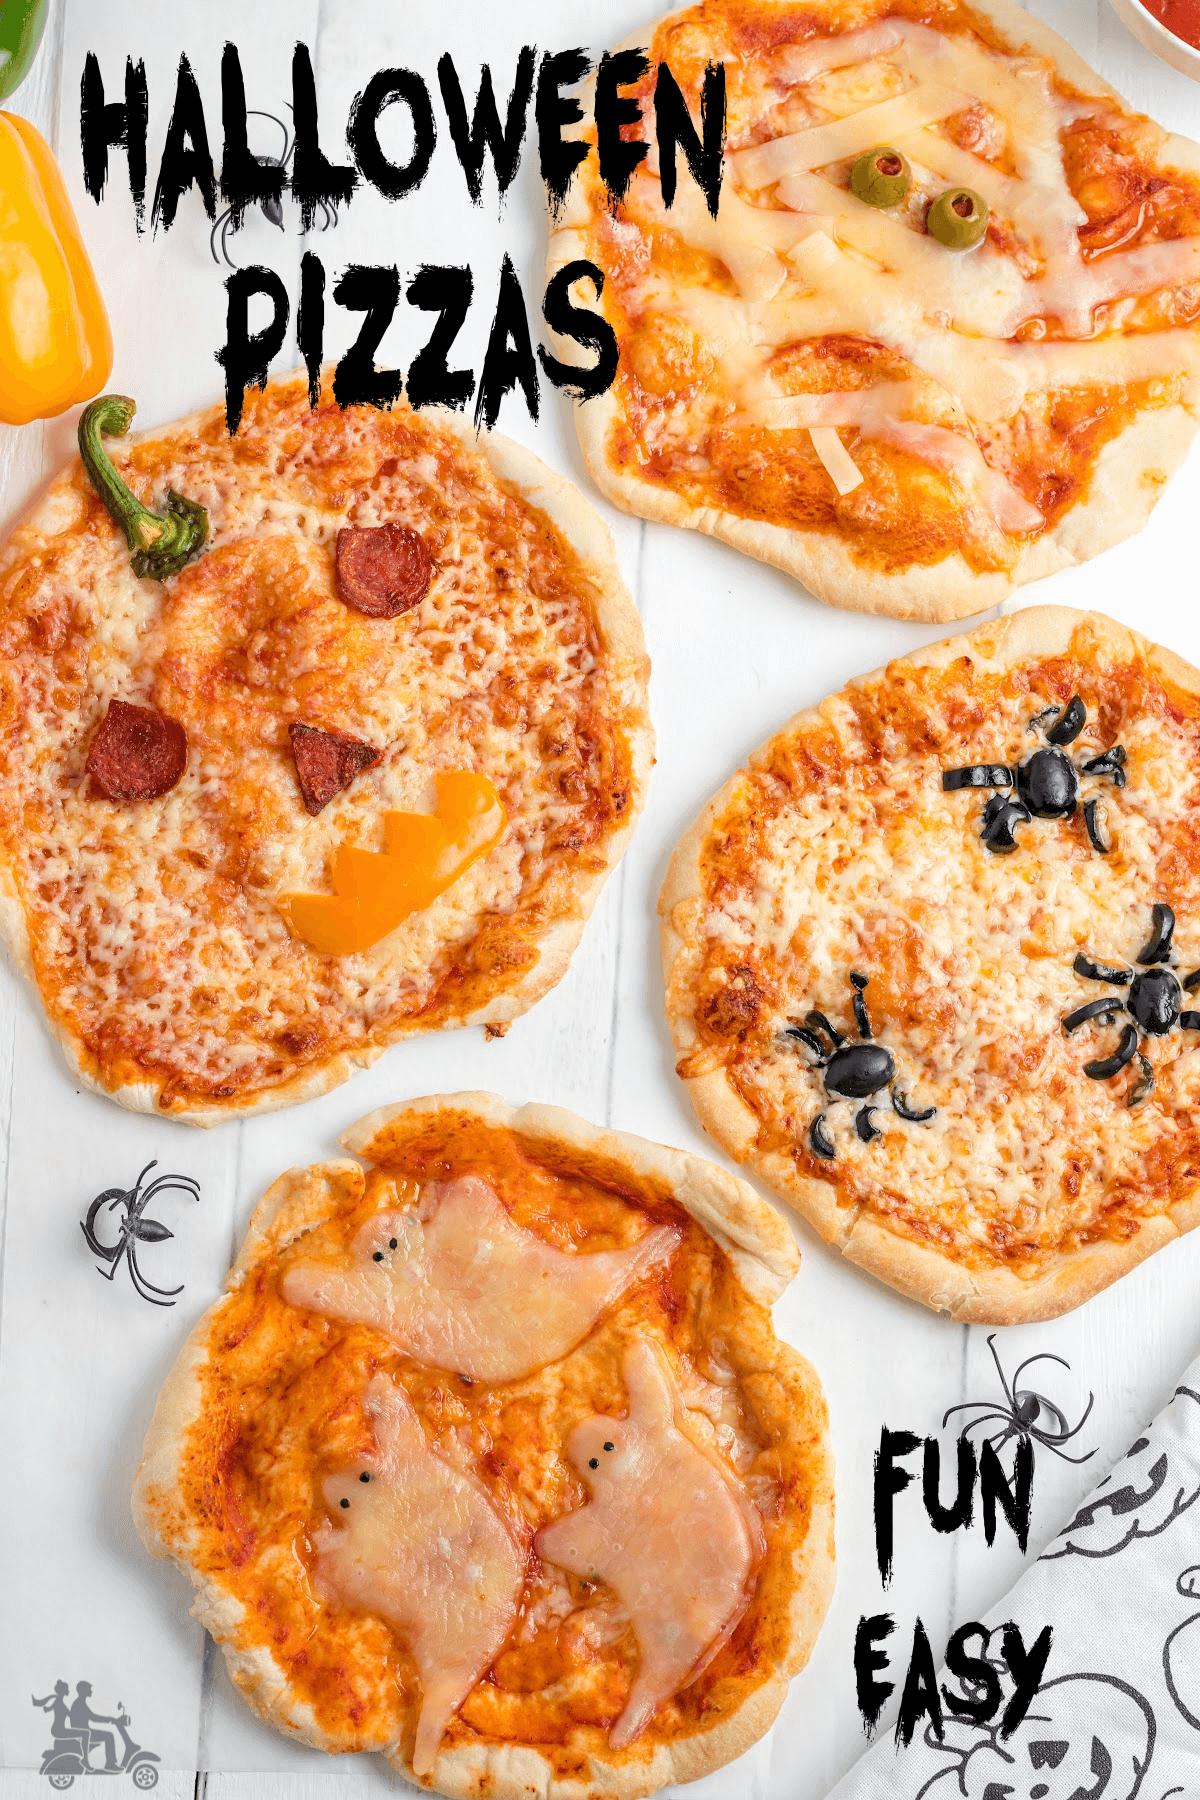 Jack-O-Lantern, Spider, Mummy, Ghost mini-pizzas for a fun Halloween party night.